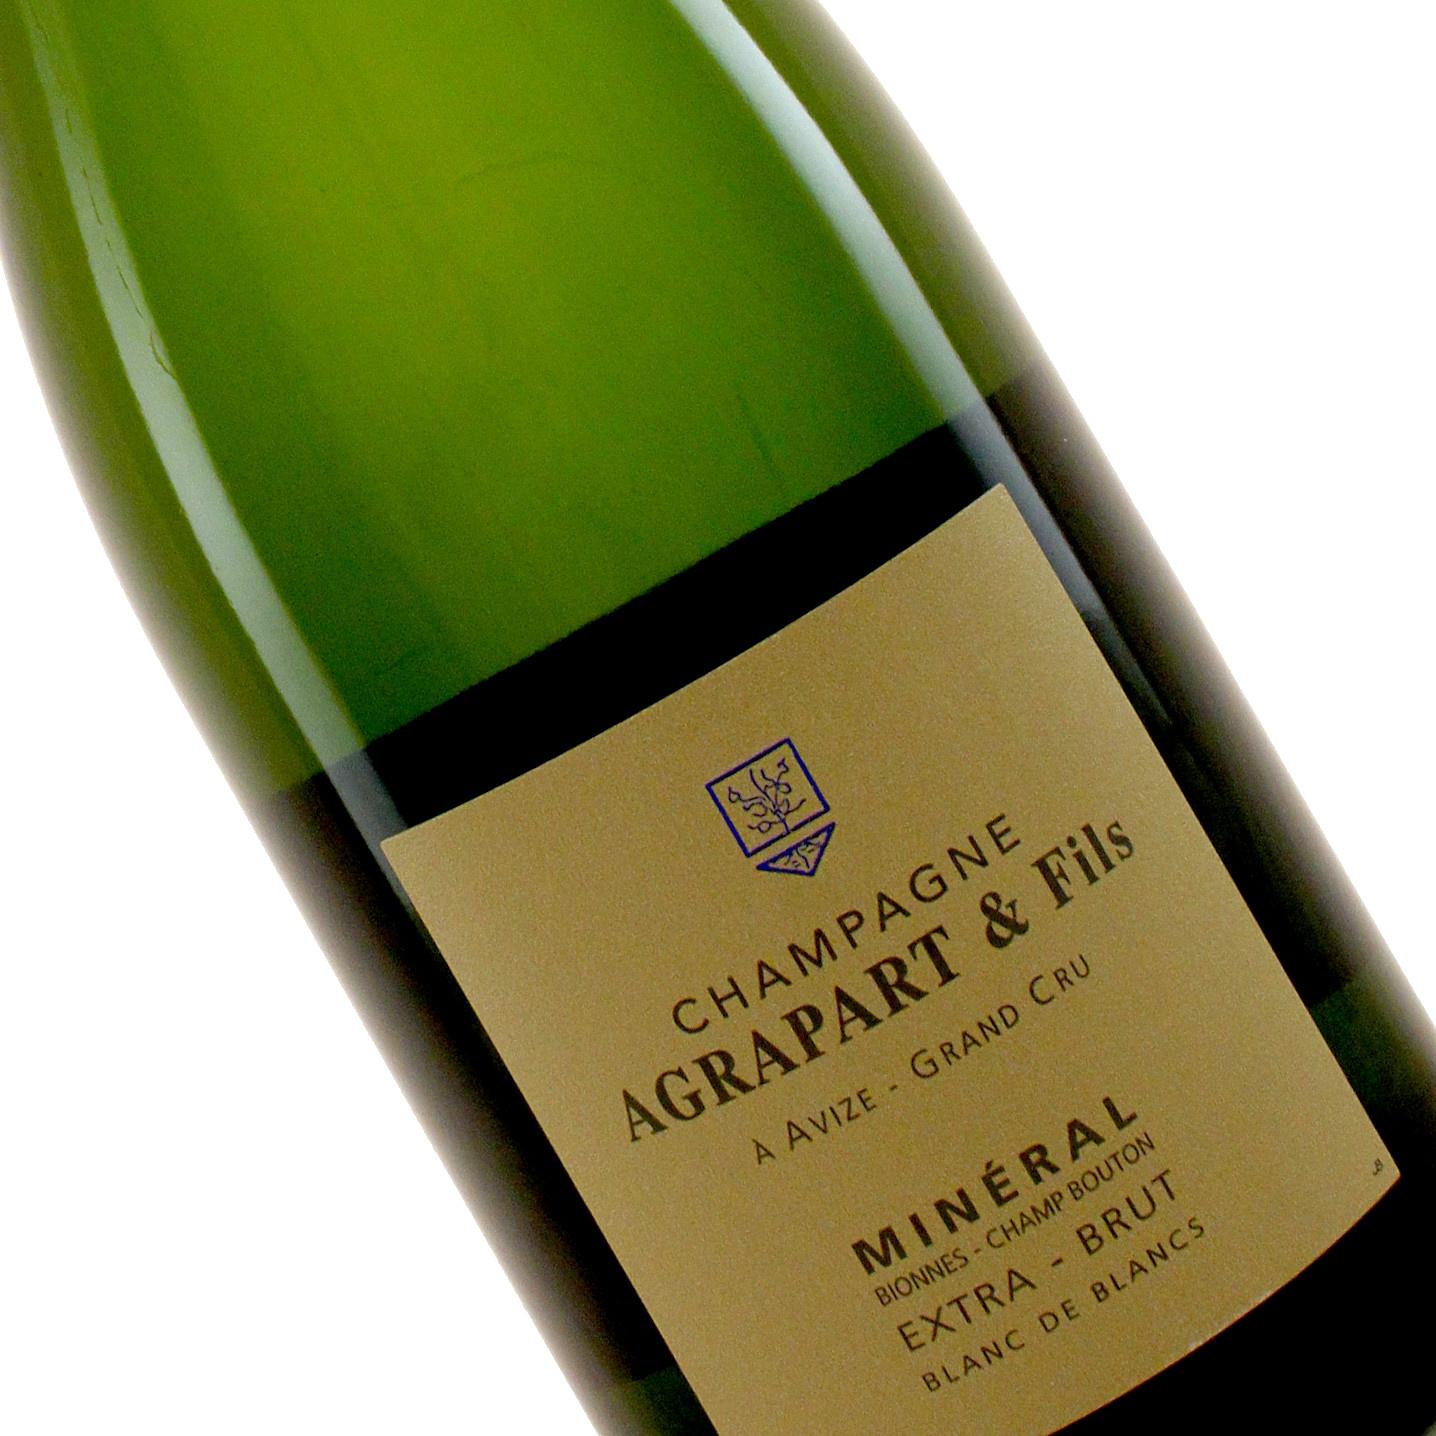 Agrapart & Fils 2012 Mineral Blanc de Blancs Extra-Brut Grand Cru , Avize, Champagne